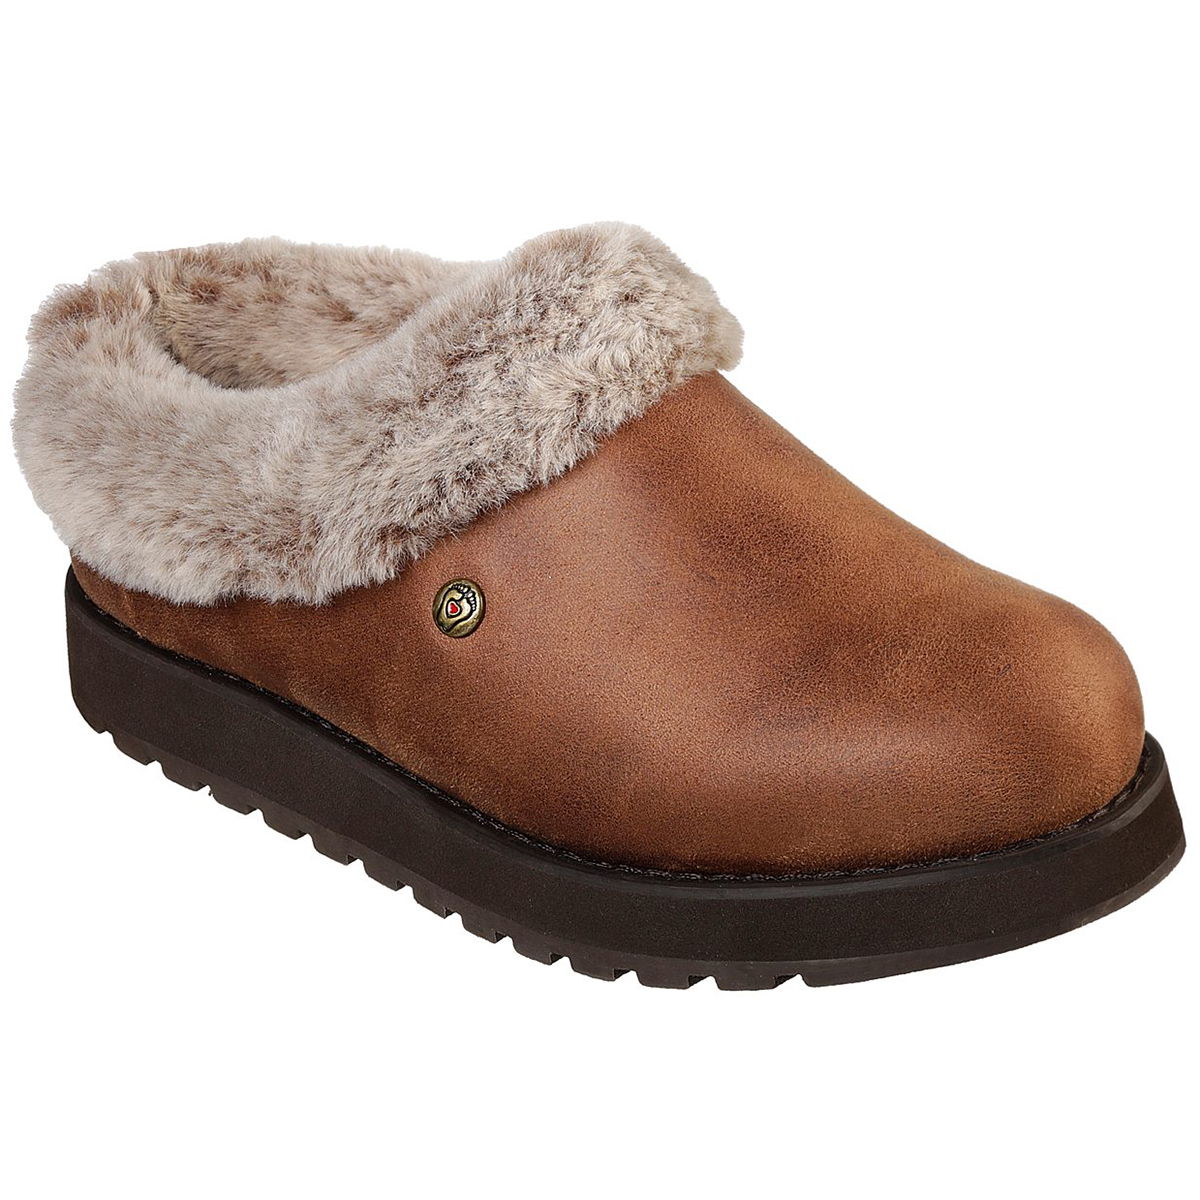 Skechers Women's Keepsakes R E M Shootie Fur Lined Casual Slip On Shoes - Brown, 7